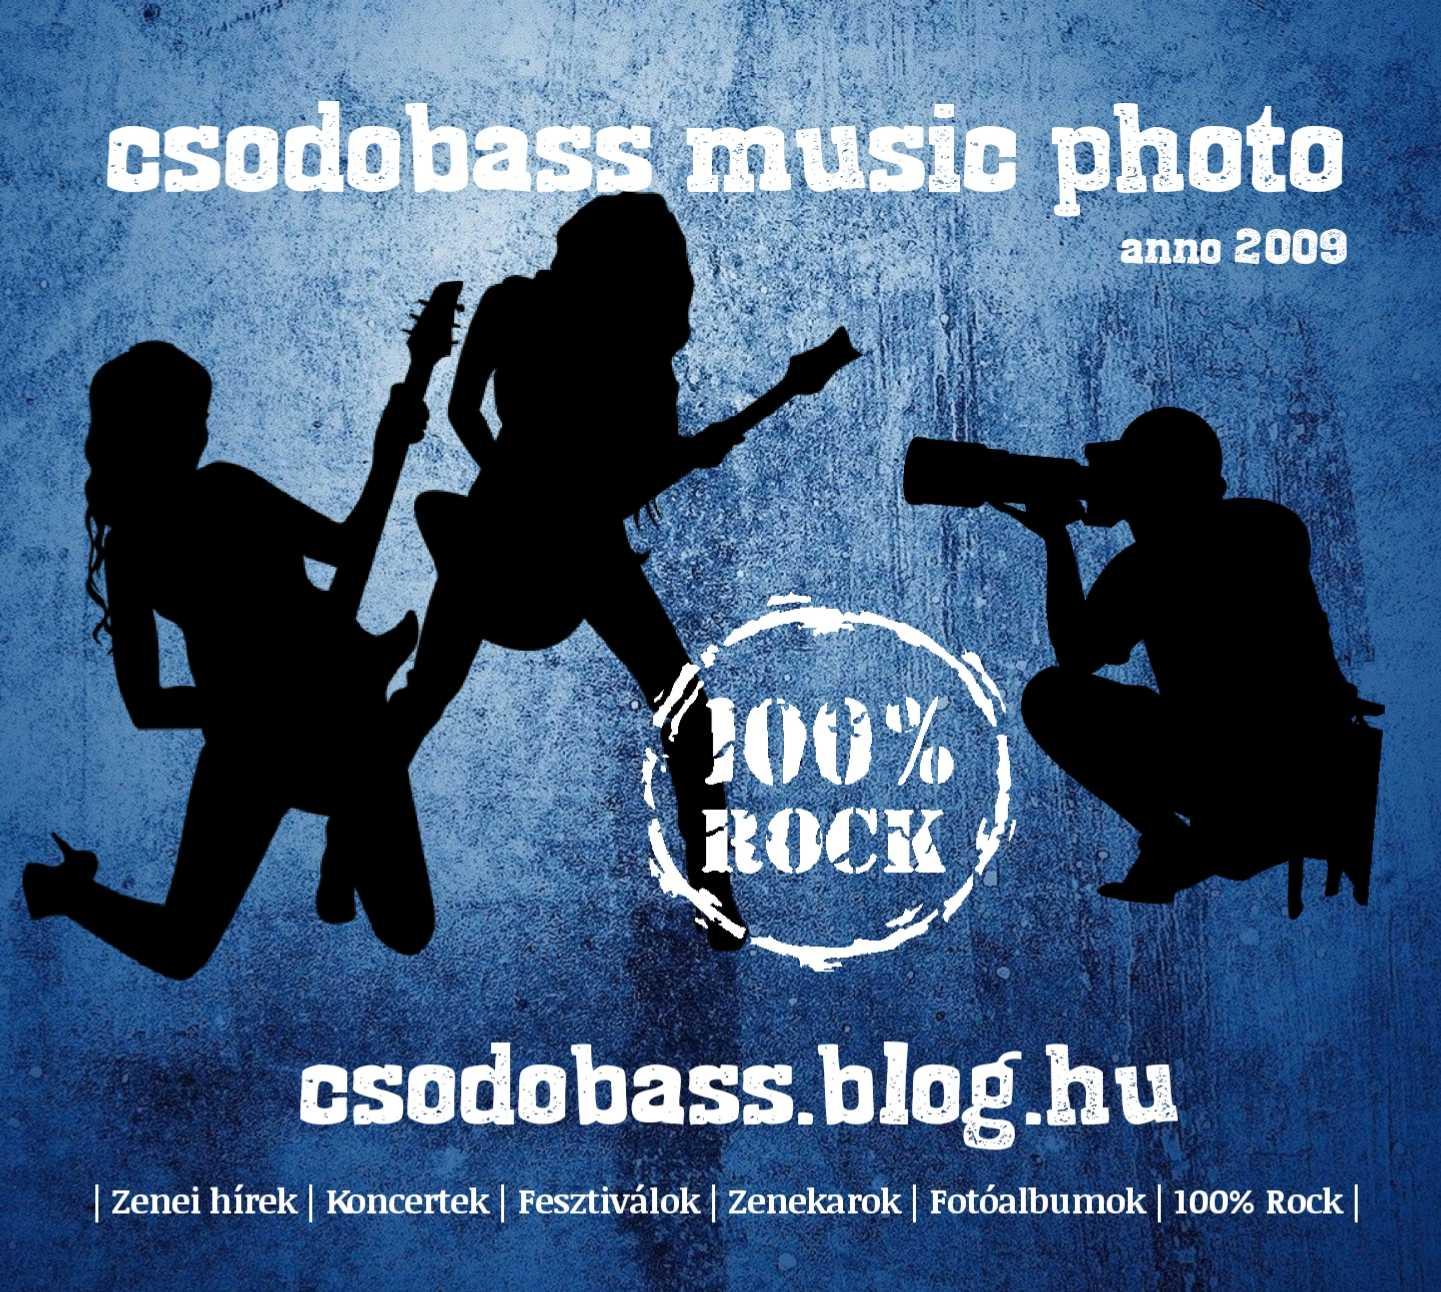 csodobass_logo_04.jpg